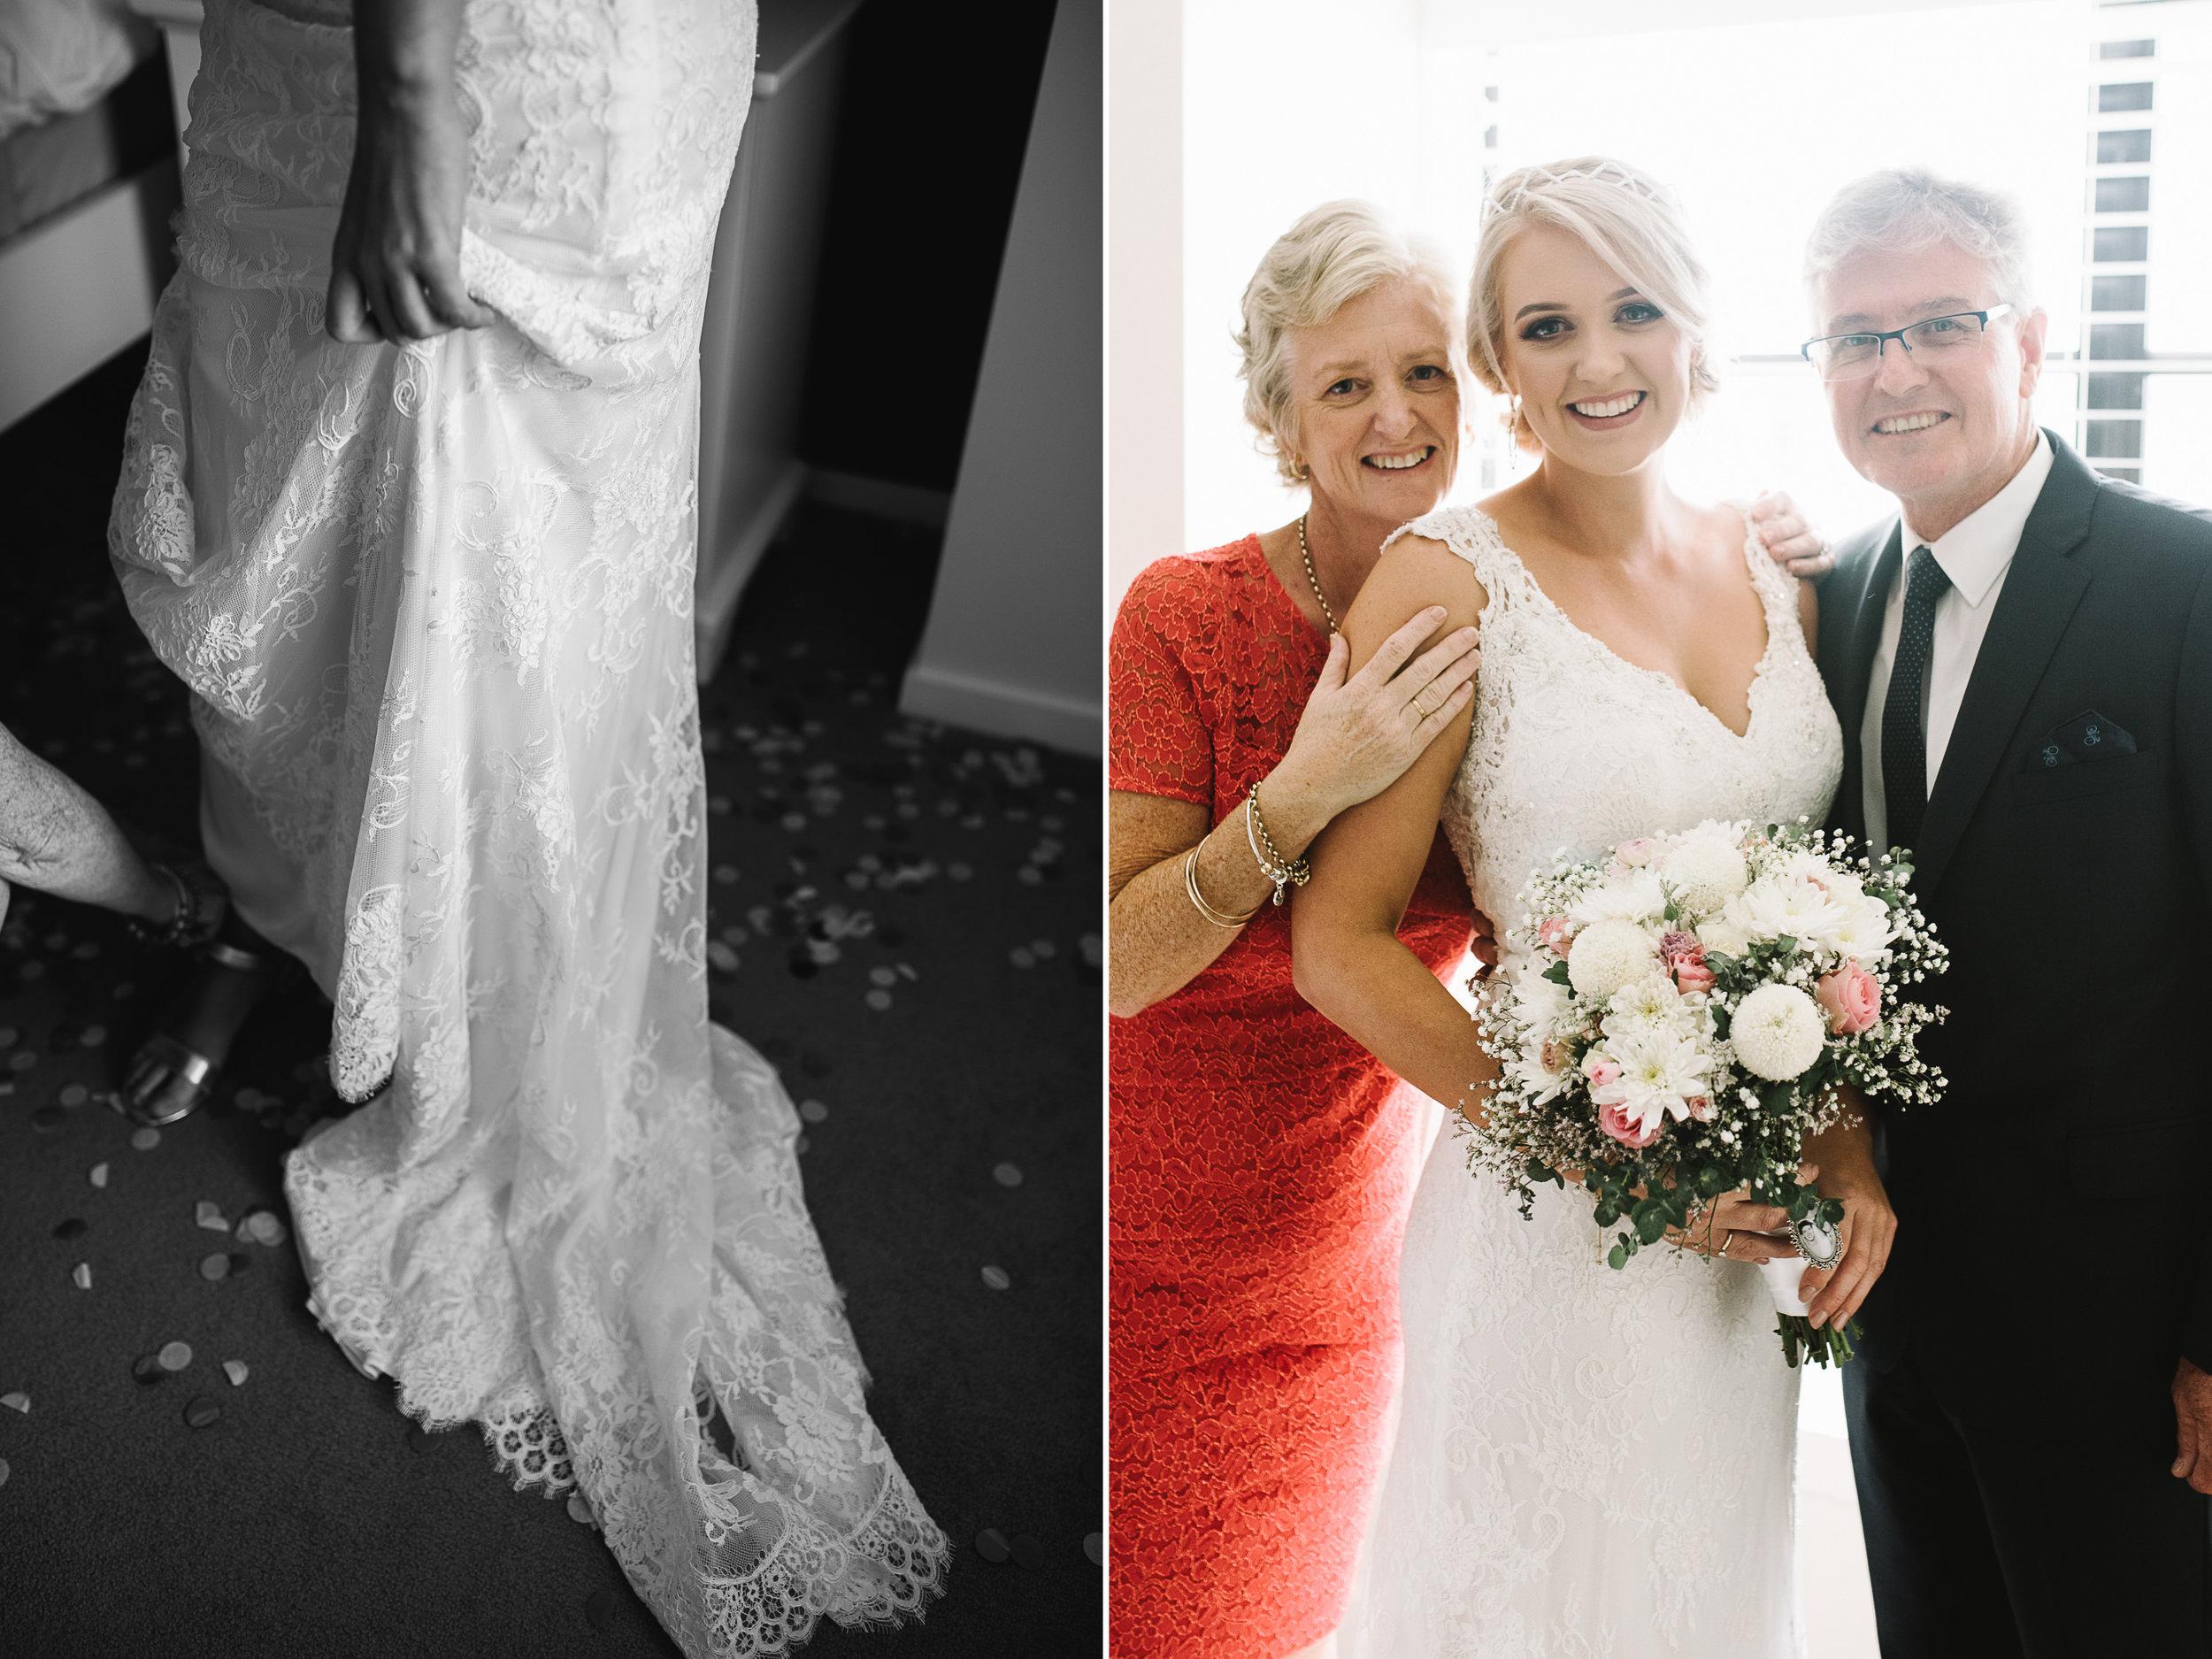 Brisbane-wedding-photography-13.jpg